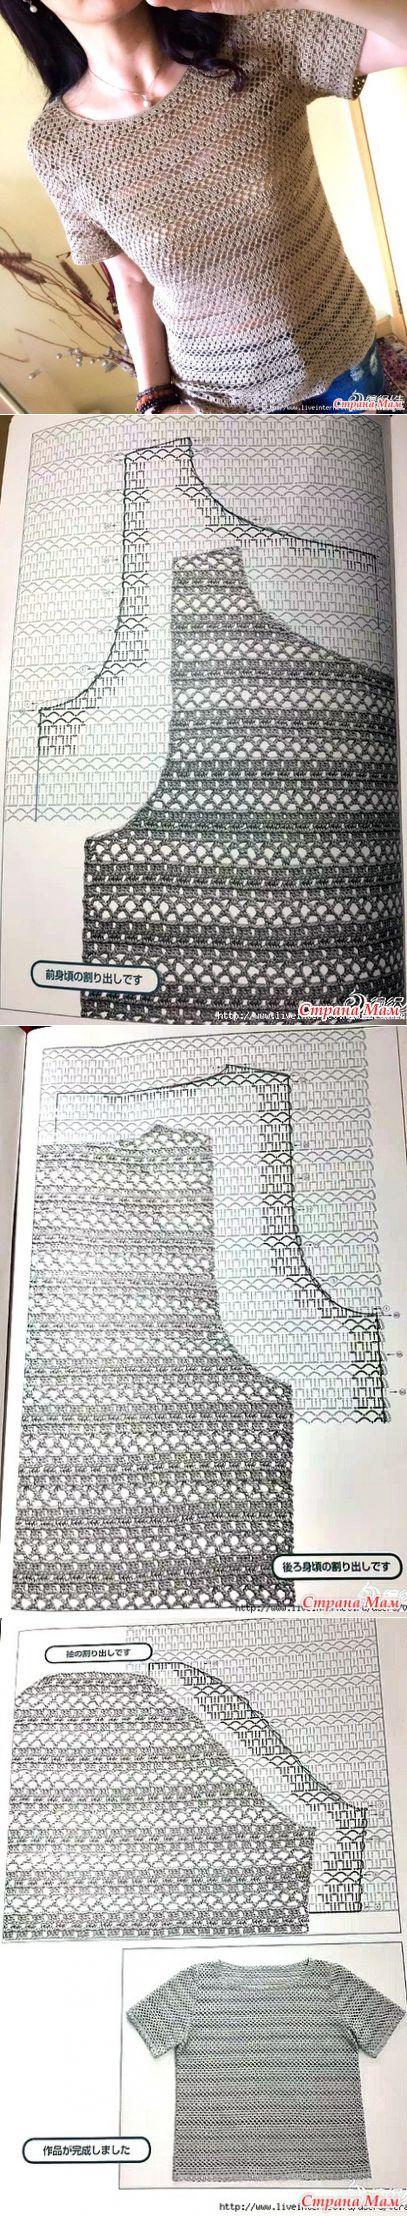 98 best chalecos crochet verano images on Pinterest | Ropas de ...